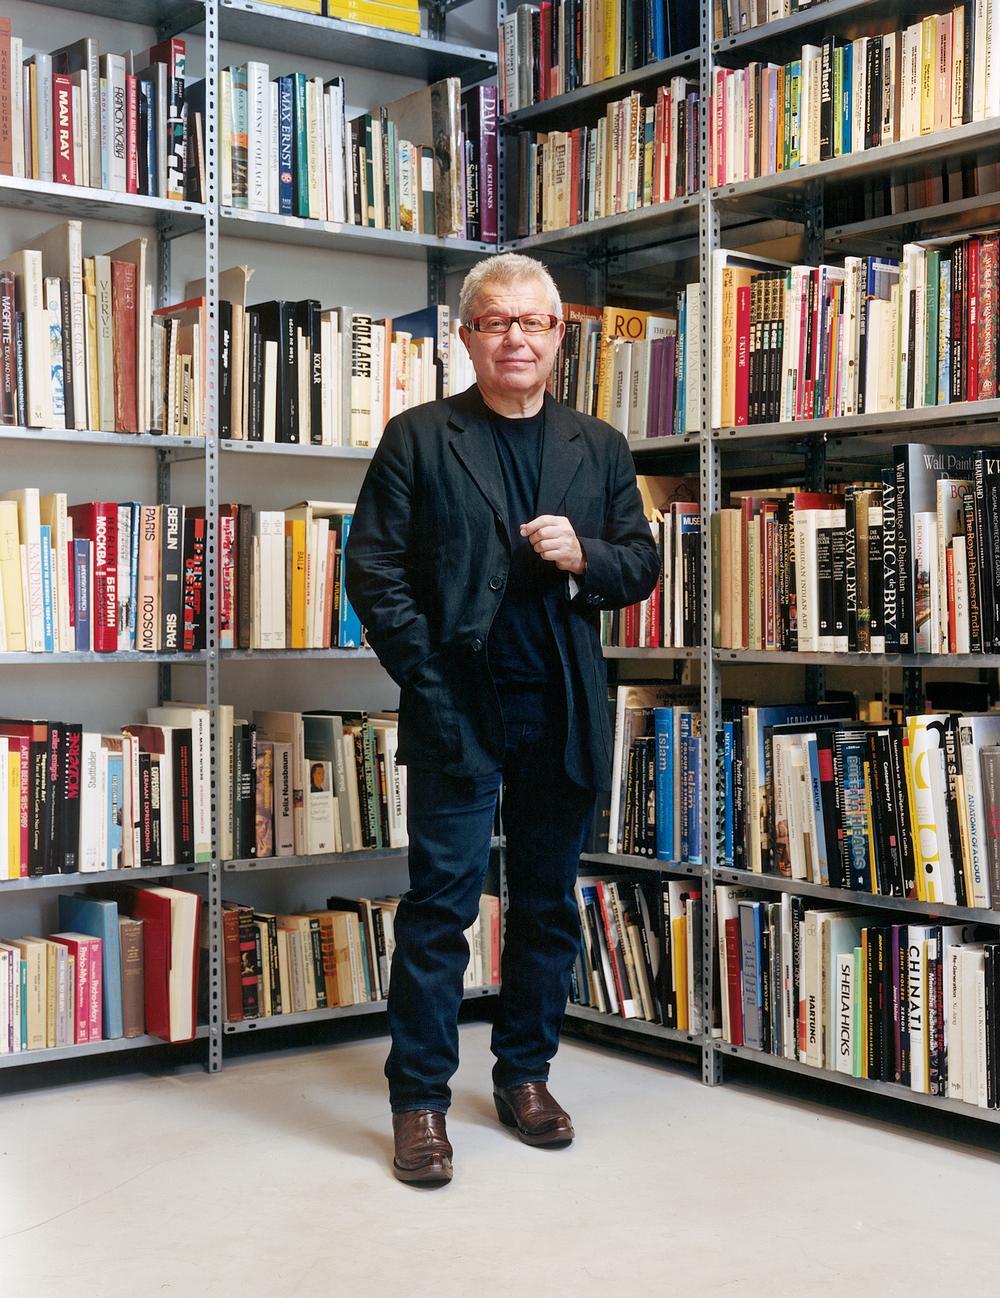 Daniel Libeskind / PHOTO: STEFAN RUIZ